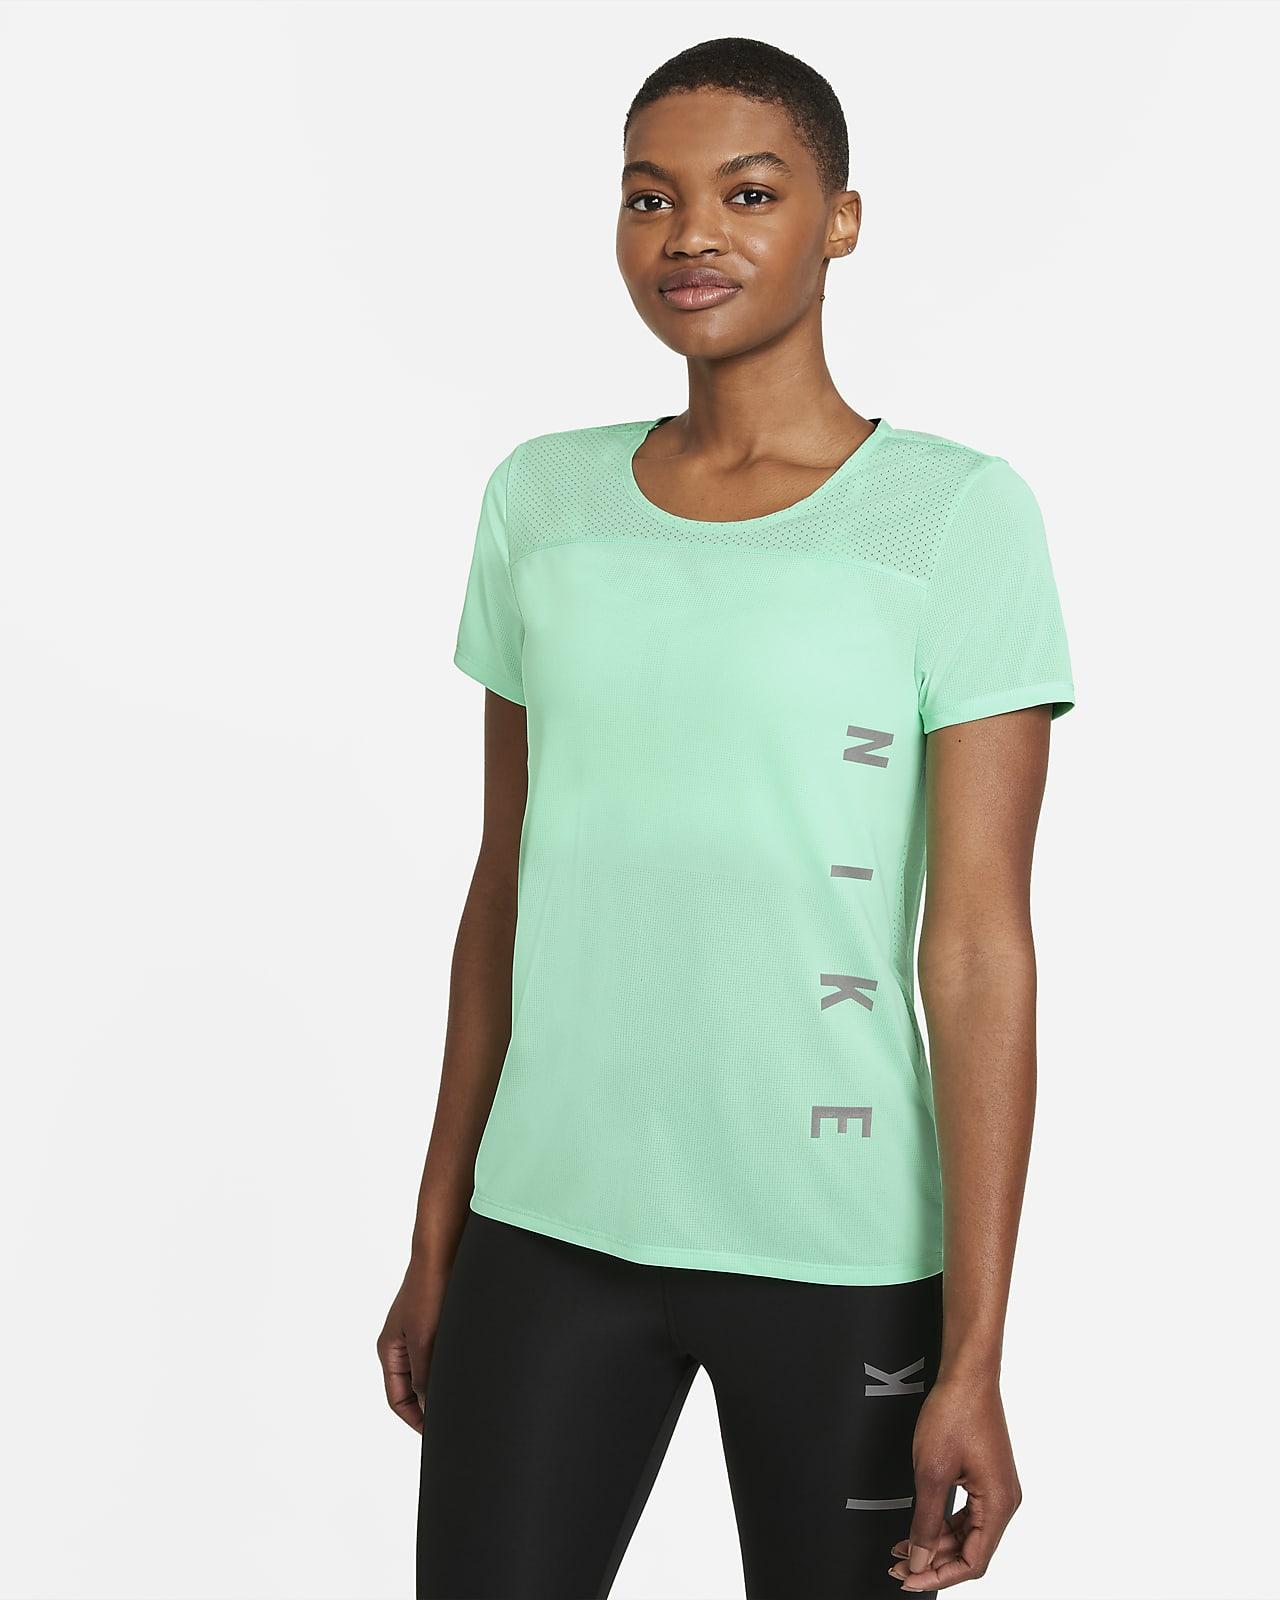 Prenda para la parte superior de running de manga corta para mujer Nike Miler Run Division